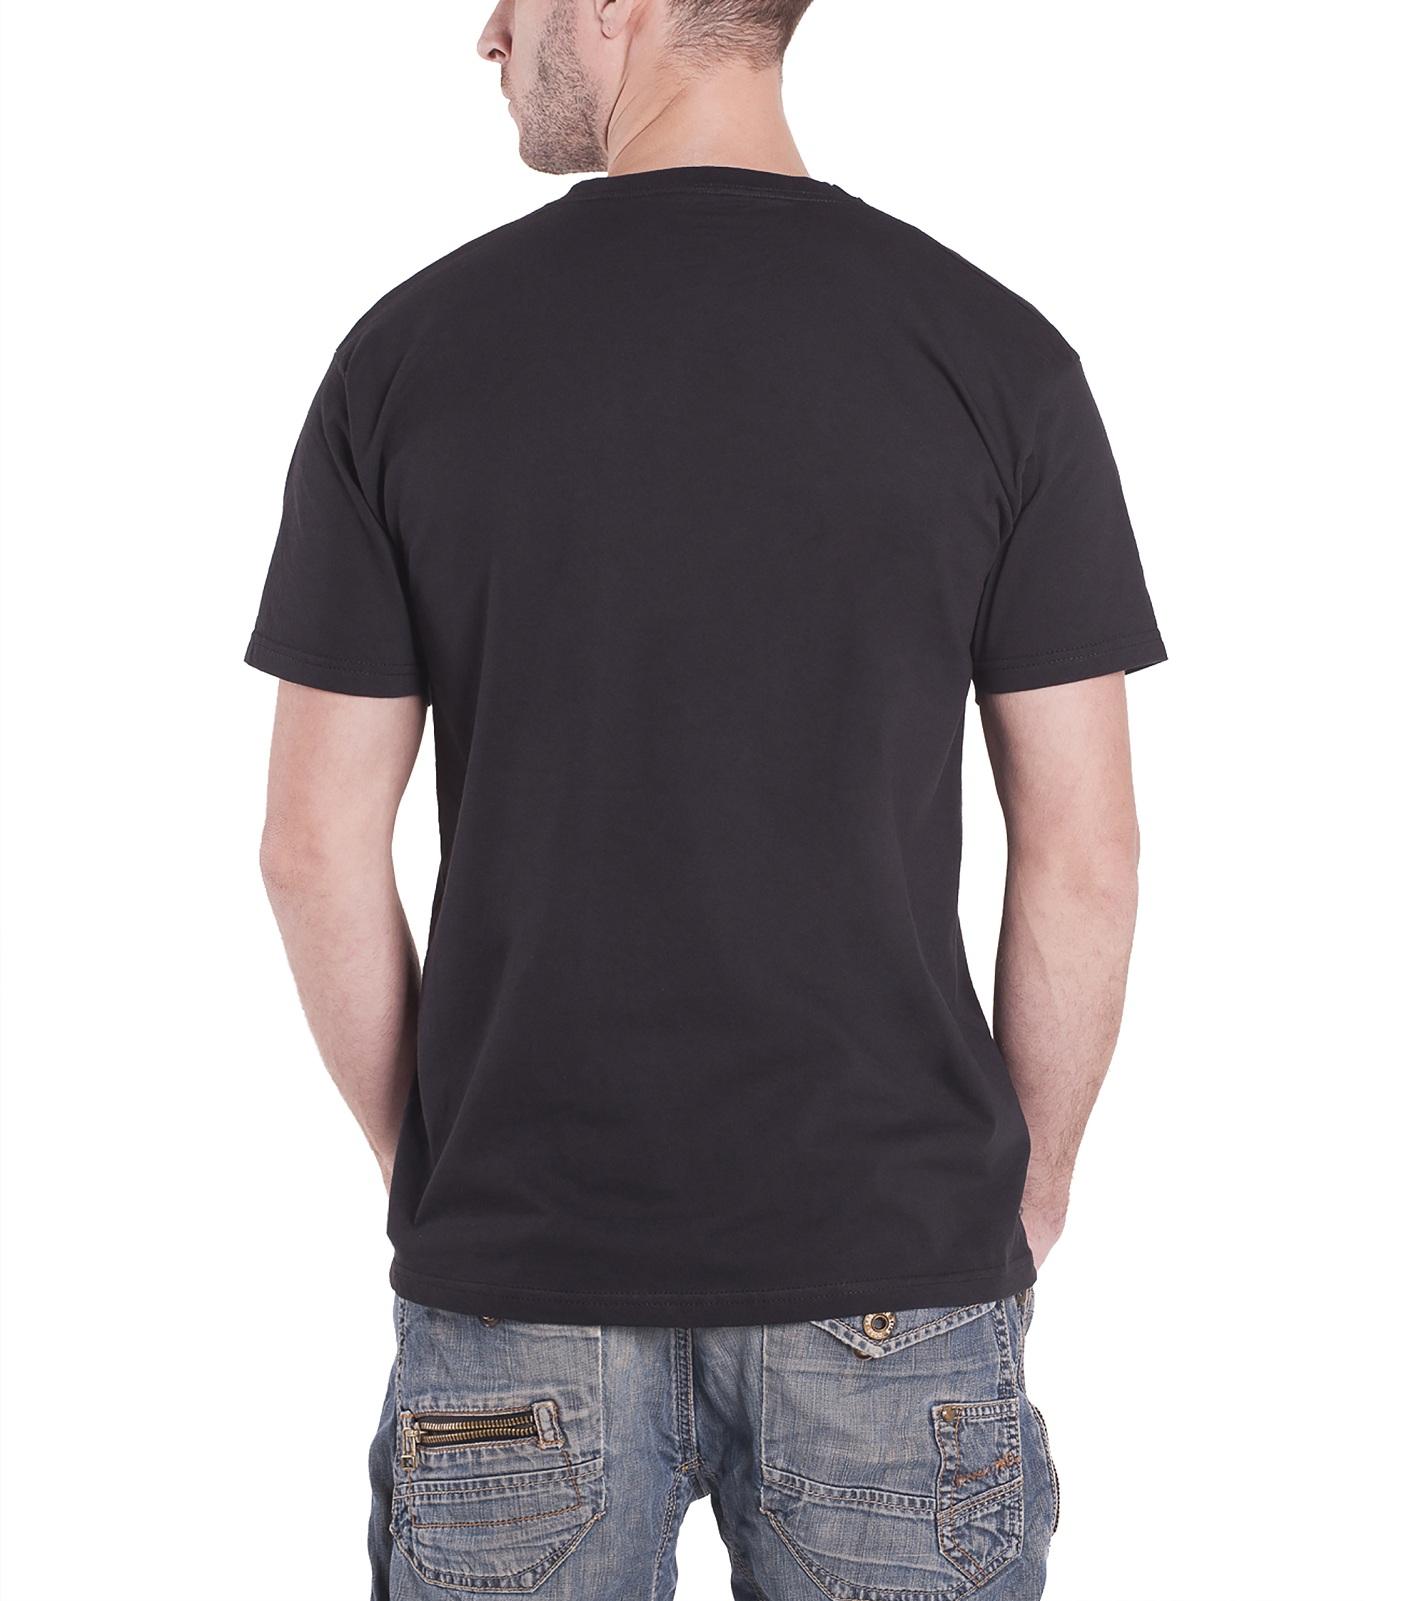 Motorhead-T-Shirt-Lemmy-RIP-England-warpig-clean-your-clock-official-new-mens Indexbild 74